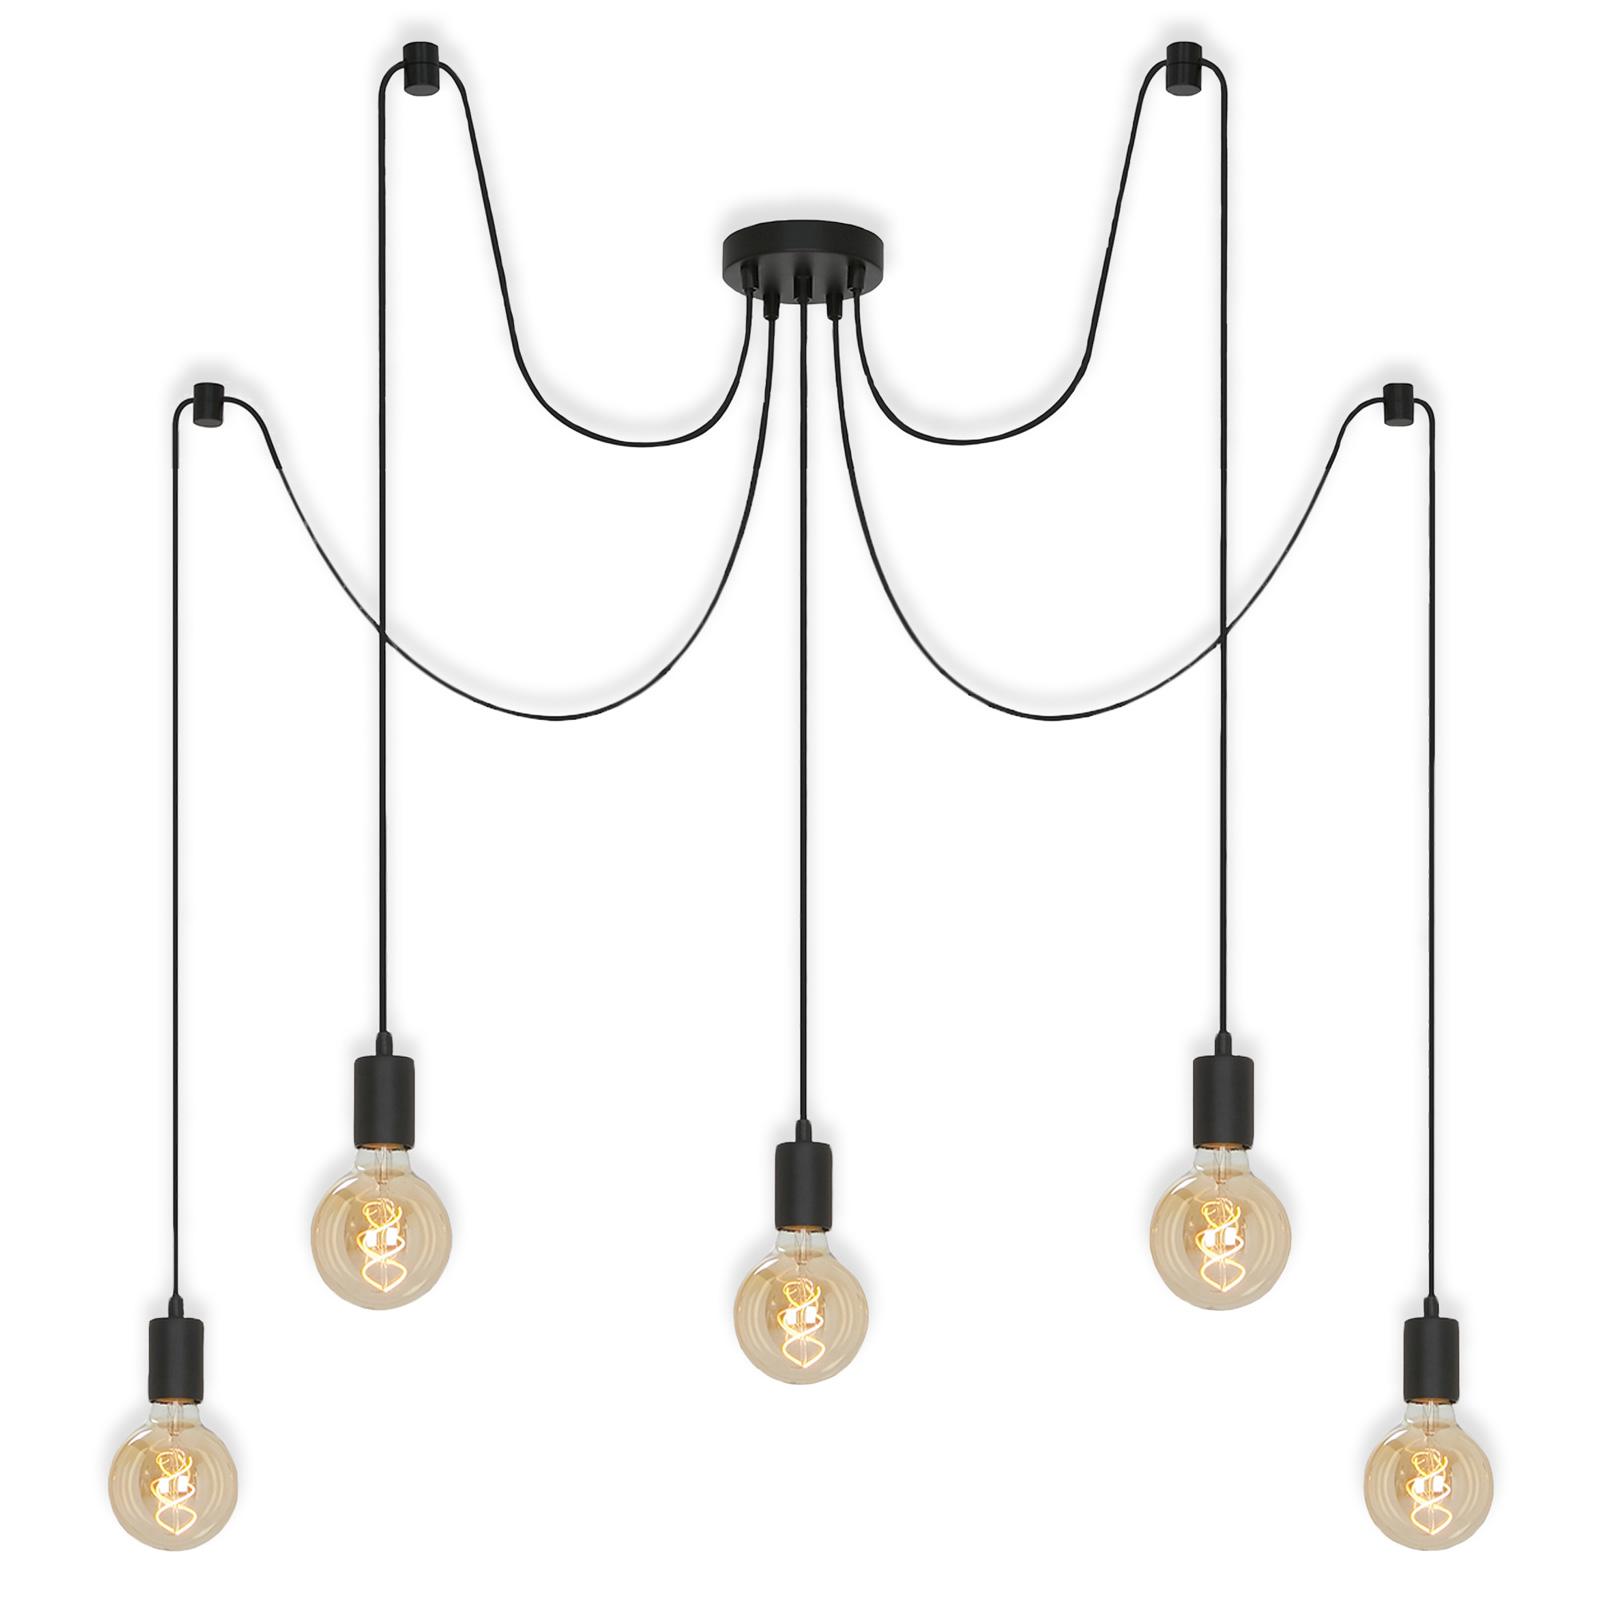 Hanglamp 4104-055 Black steel, 5-lamps